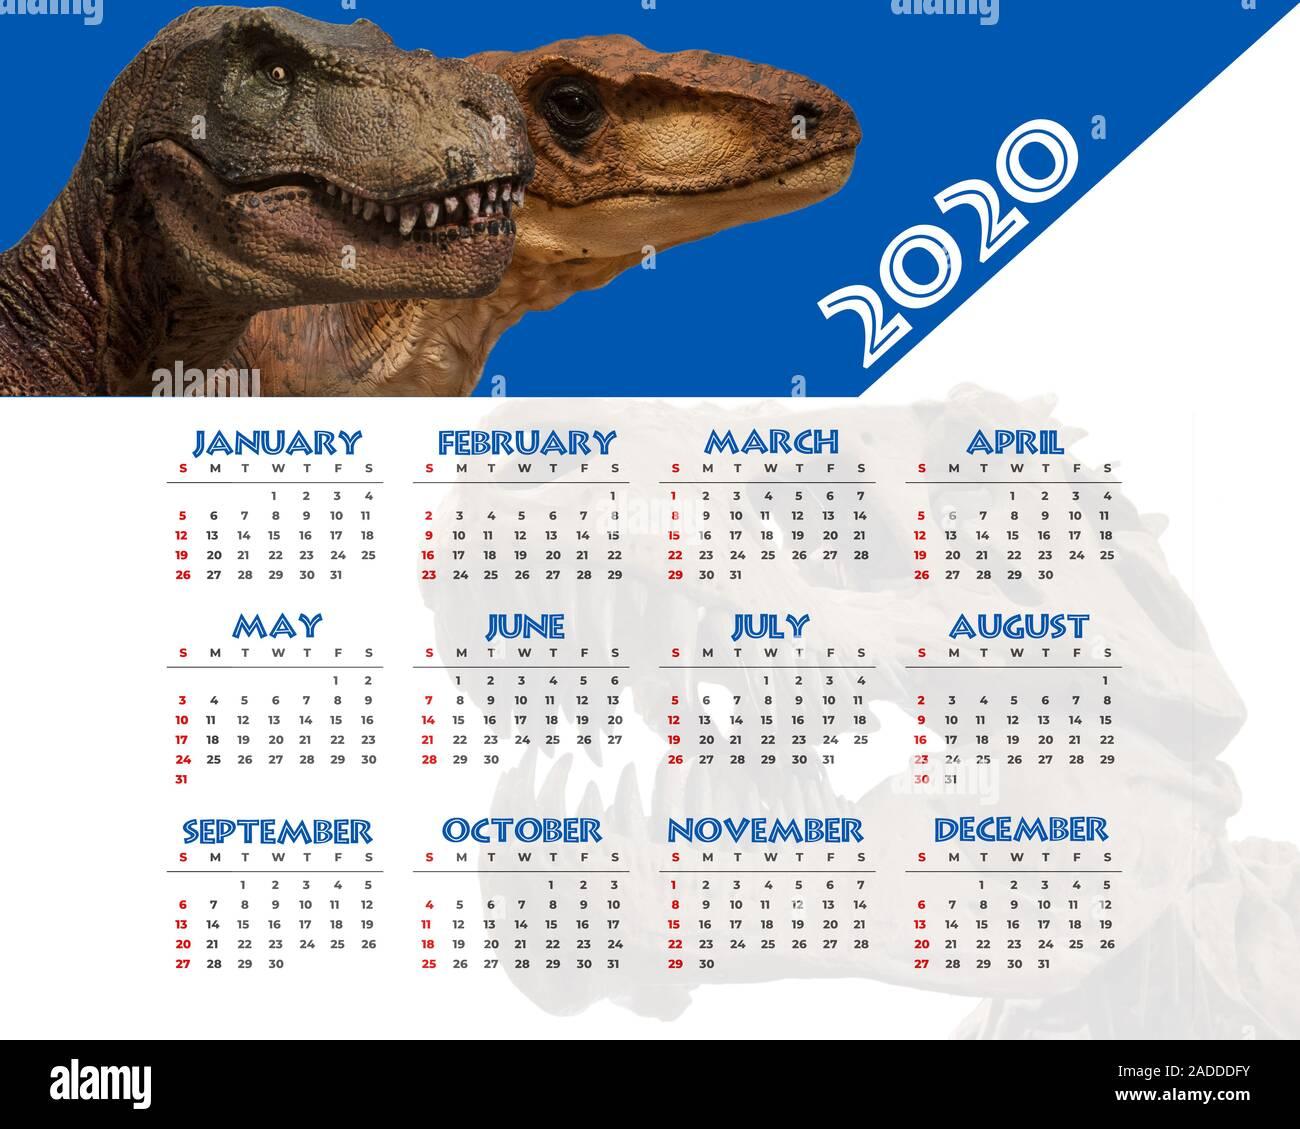 2020 Dinosaur calendar